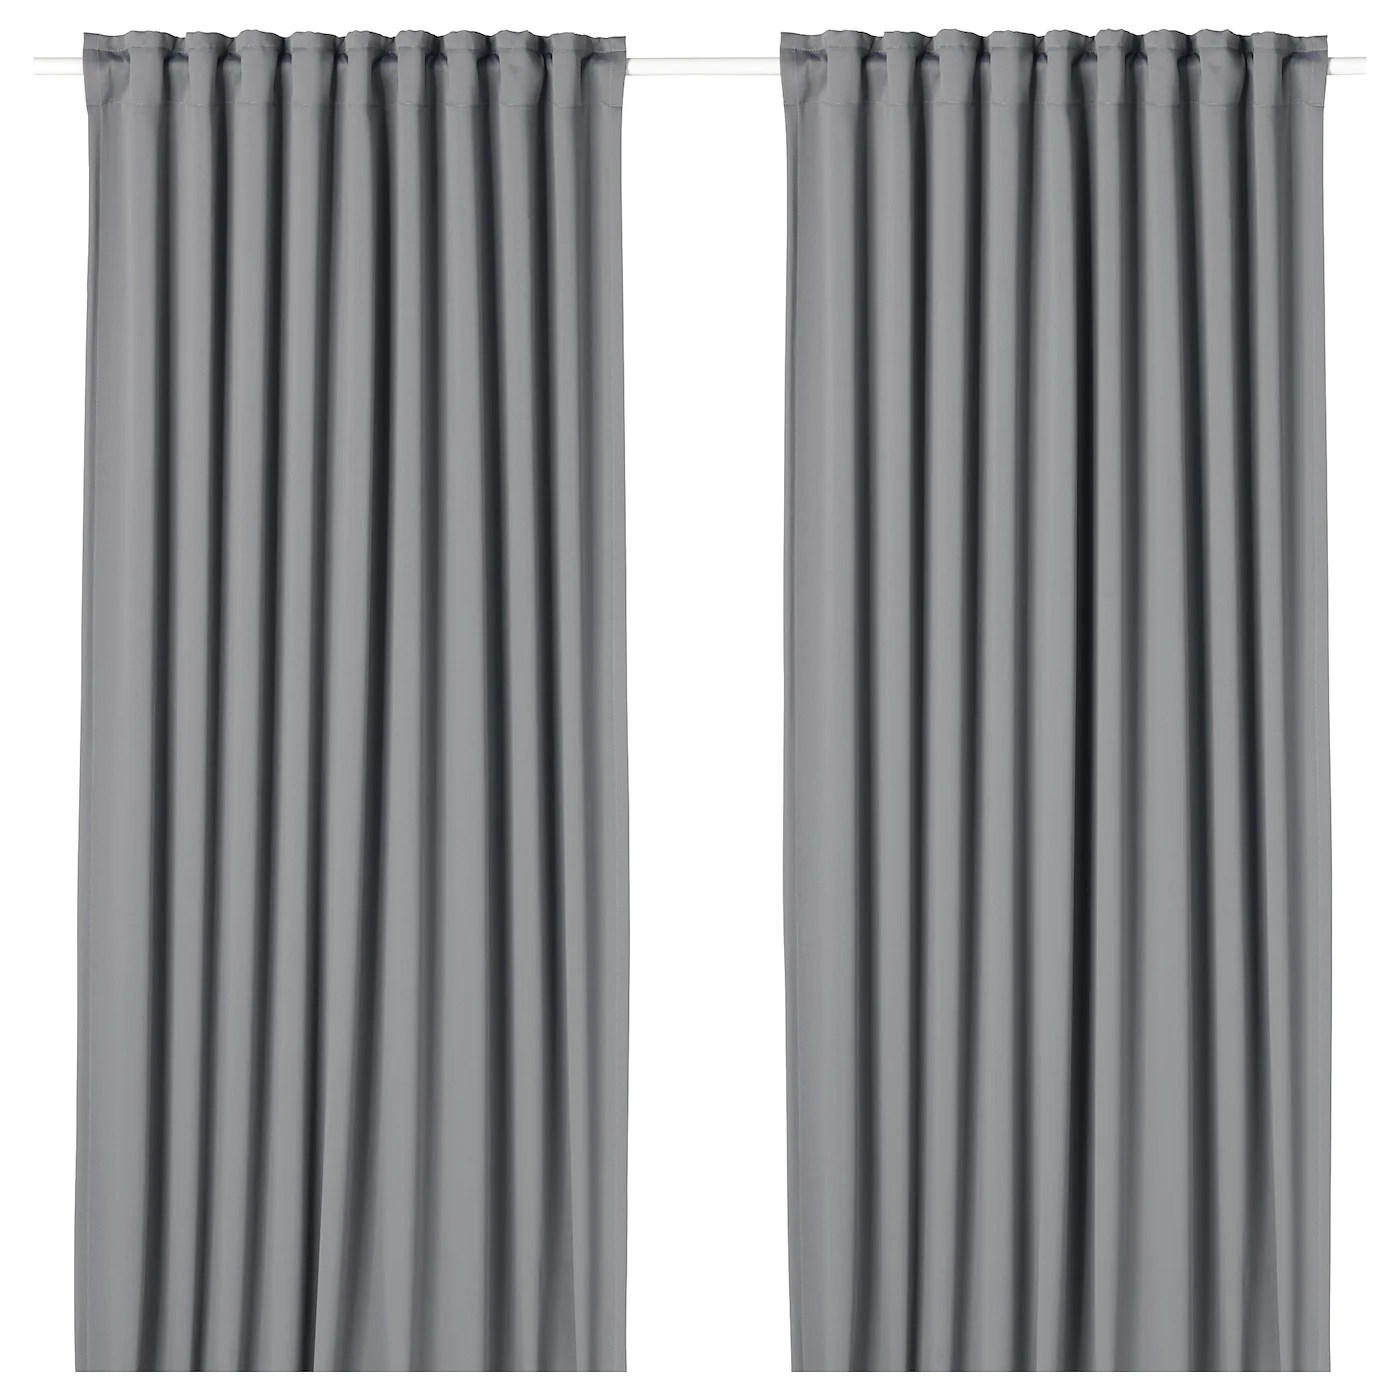 majgull blackout curtains 1 pair gray 57x98 145x250 cm